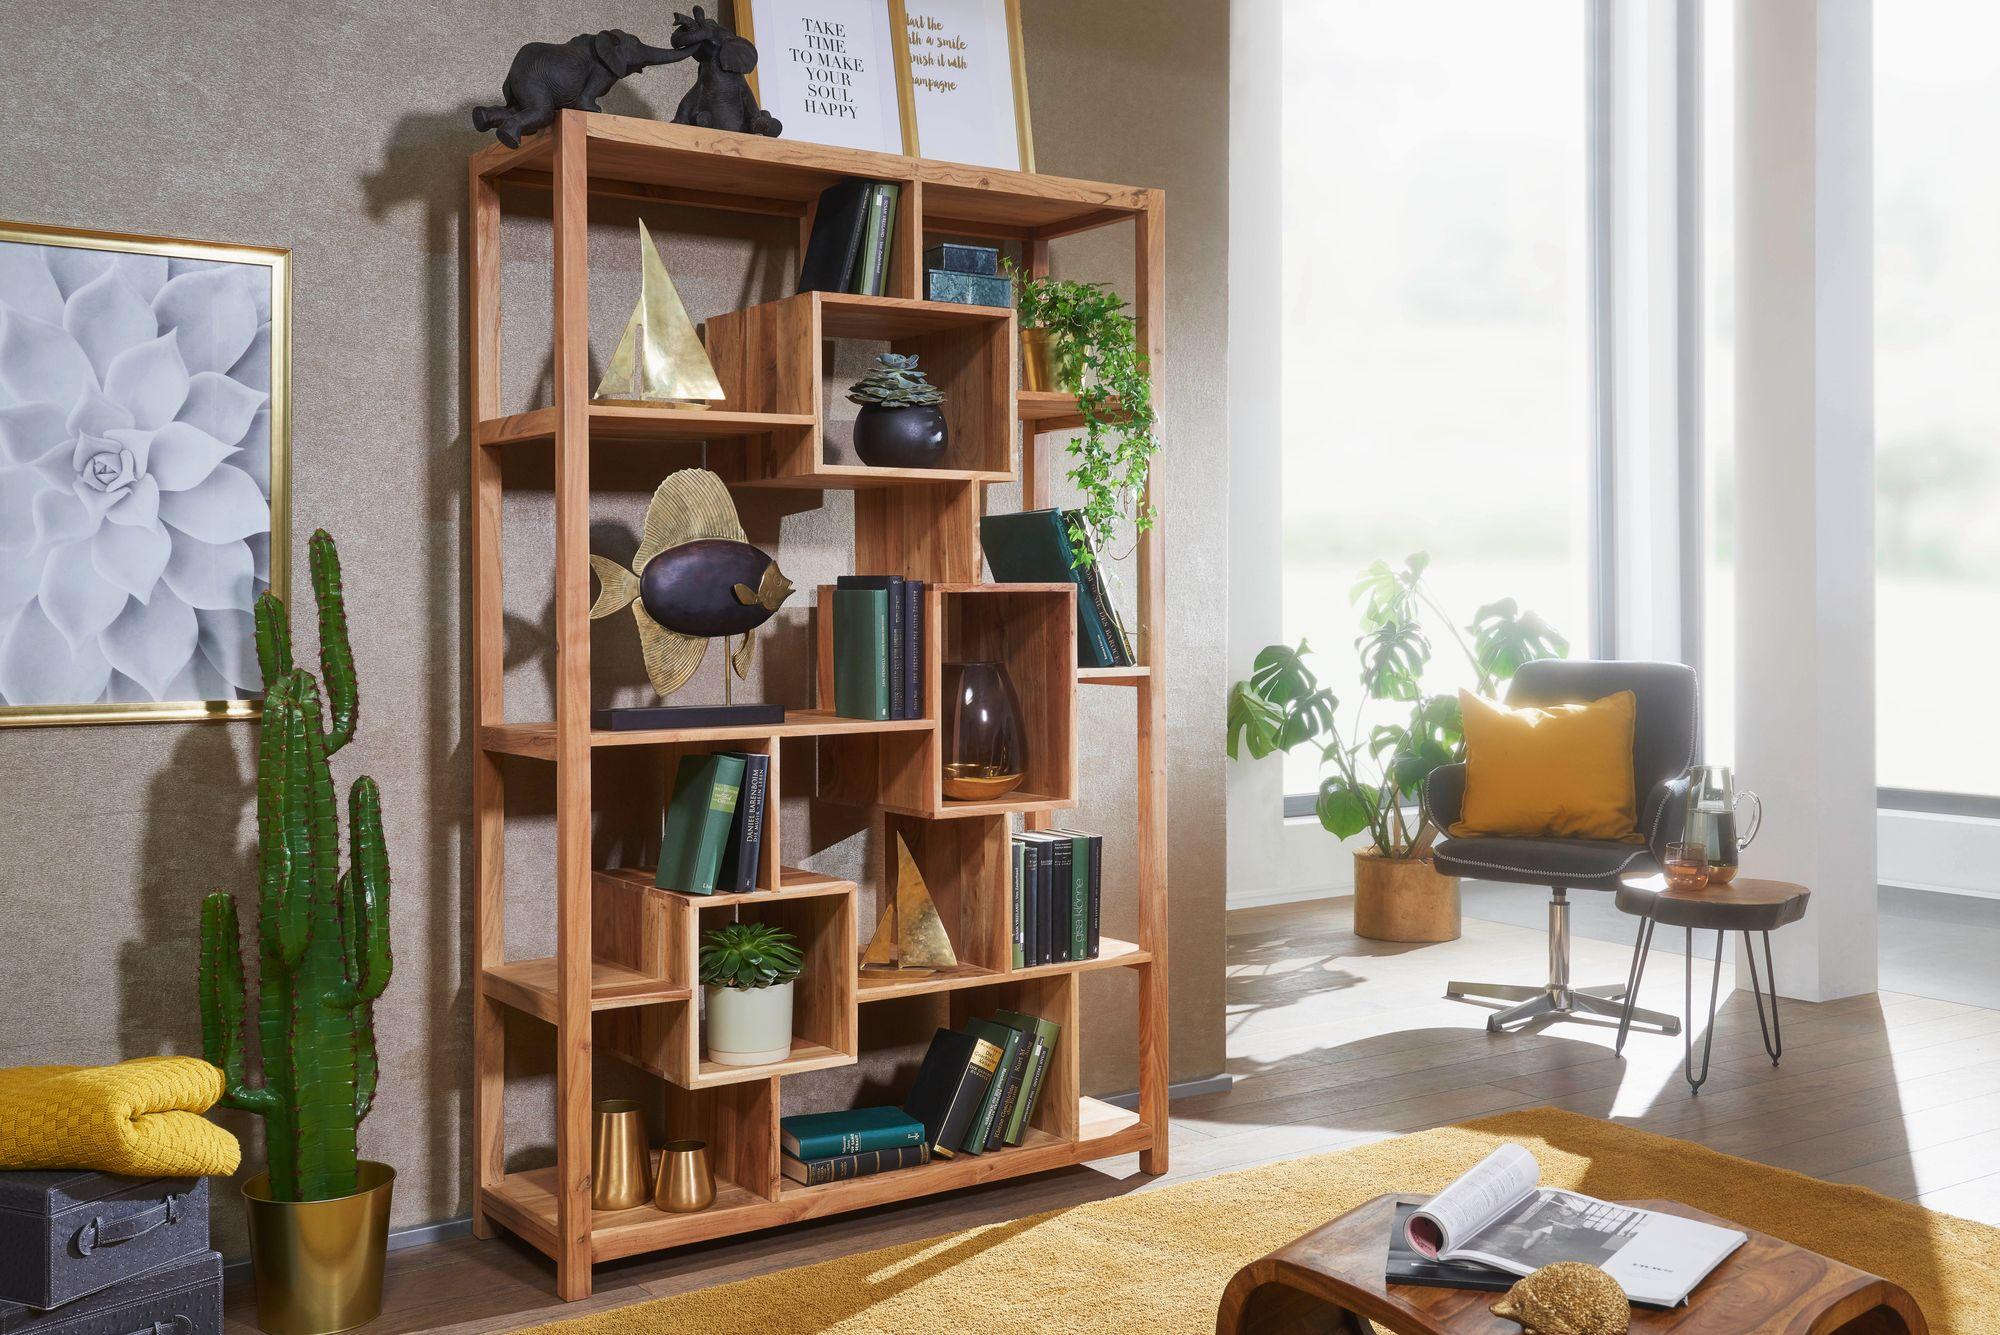 WOHNLING Bücherregal MUMBAI Massivholz Akazie 180 cm Massivholz Regal  Raumteiler Neu